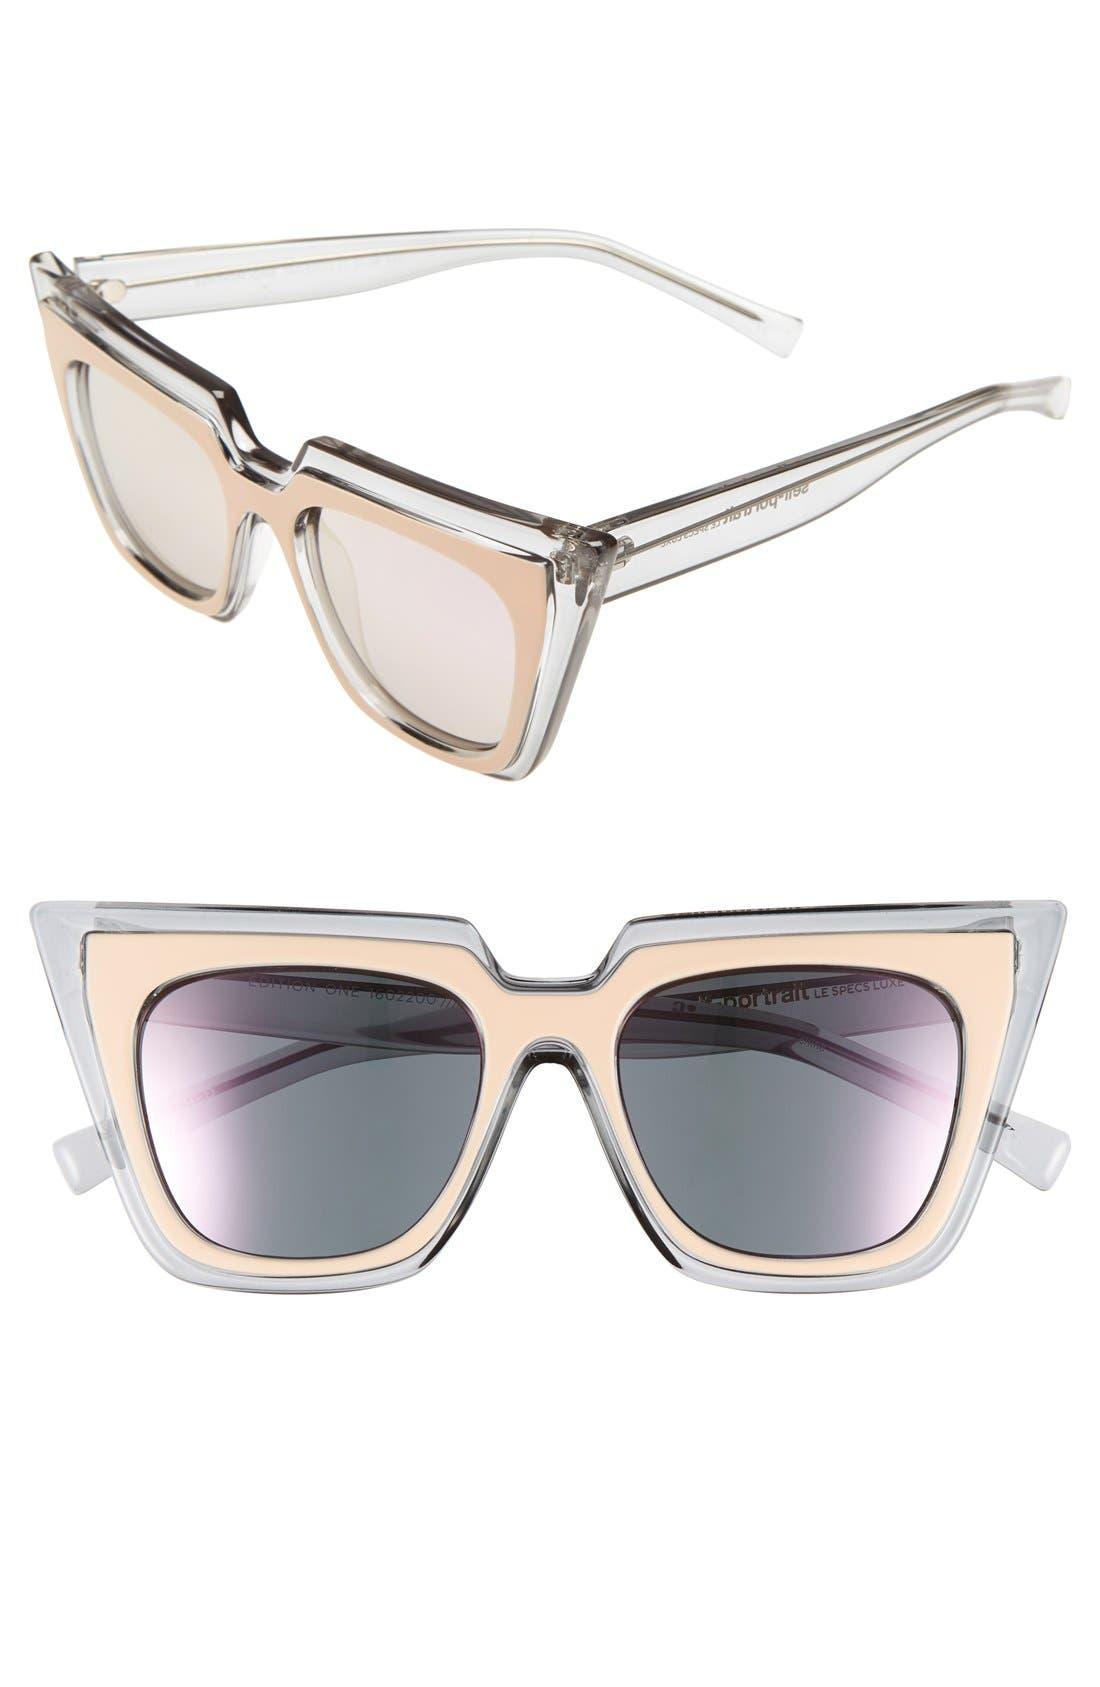 Main Image - Le Specs 'Edition One' 51mm Sunglasses